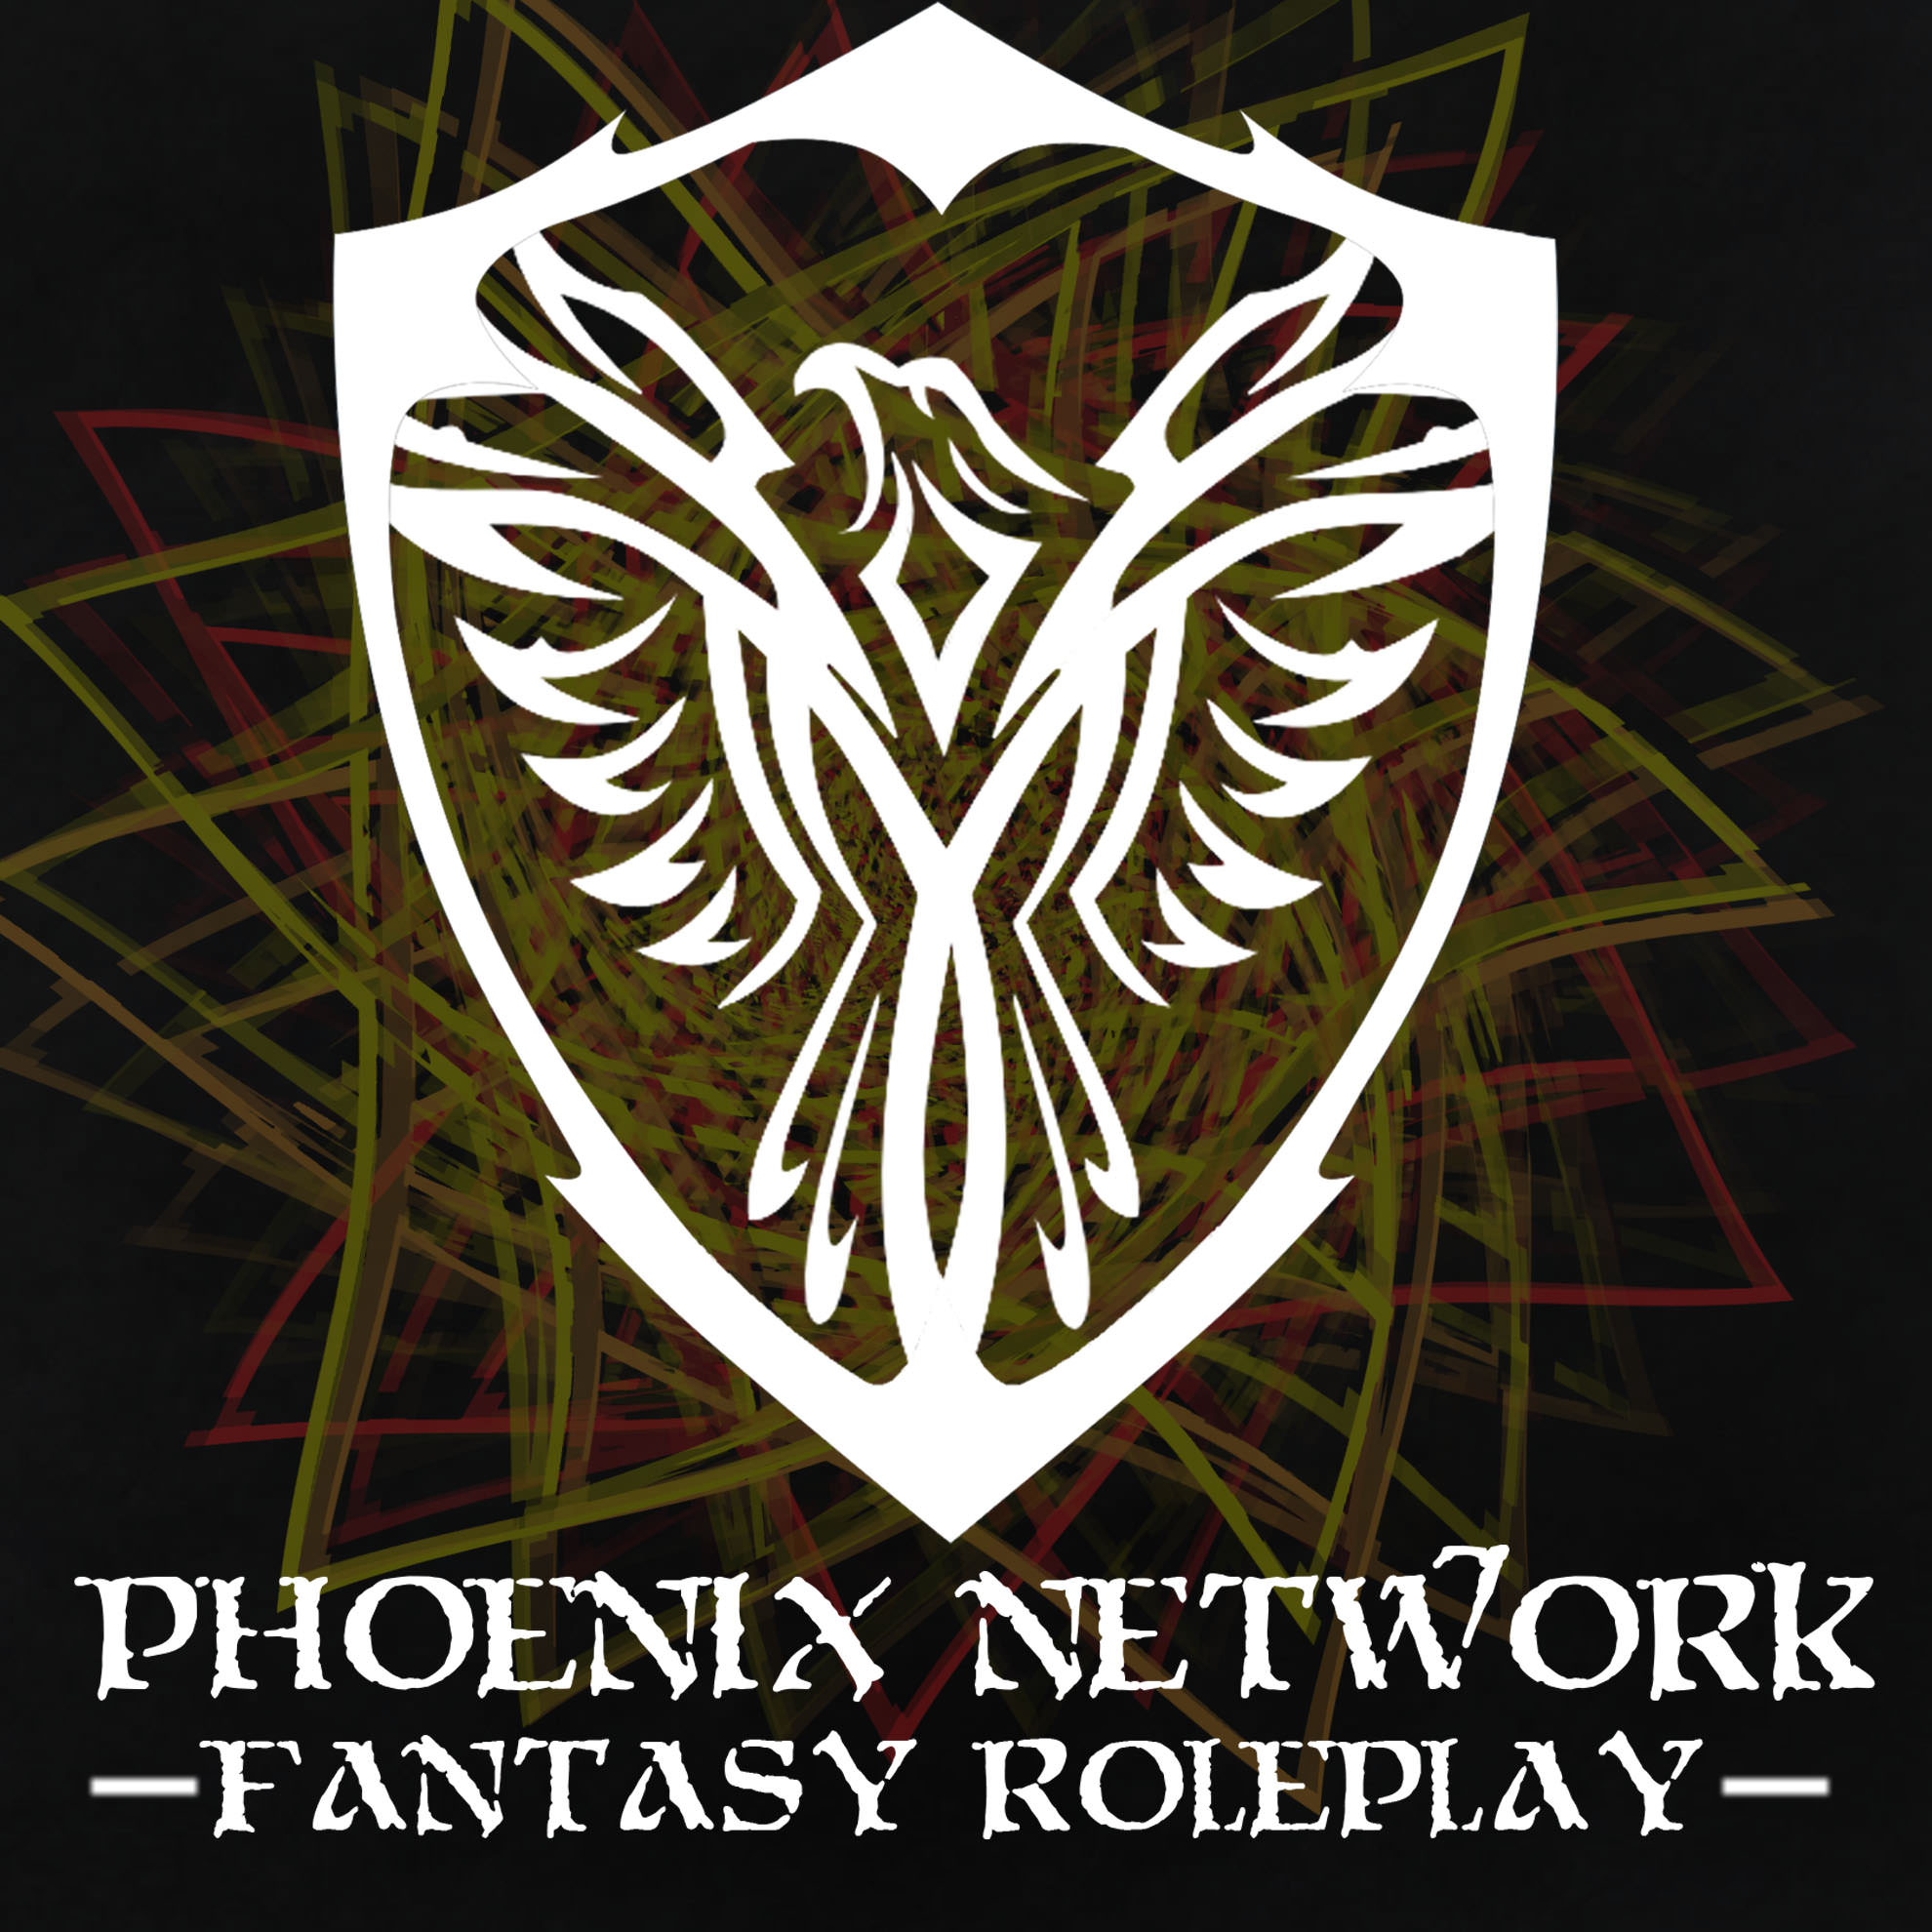 i wanna be the phoenix bgm